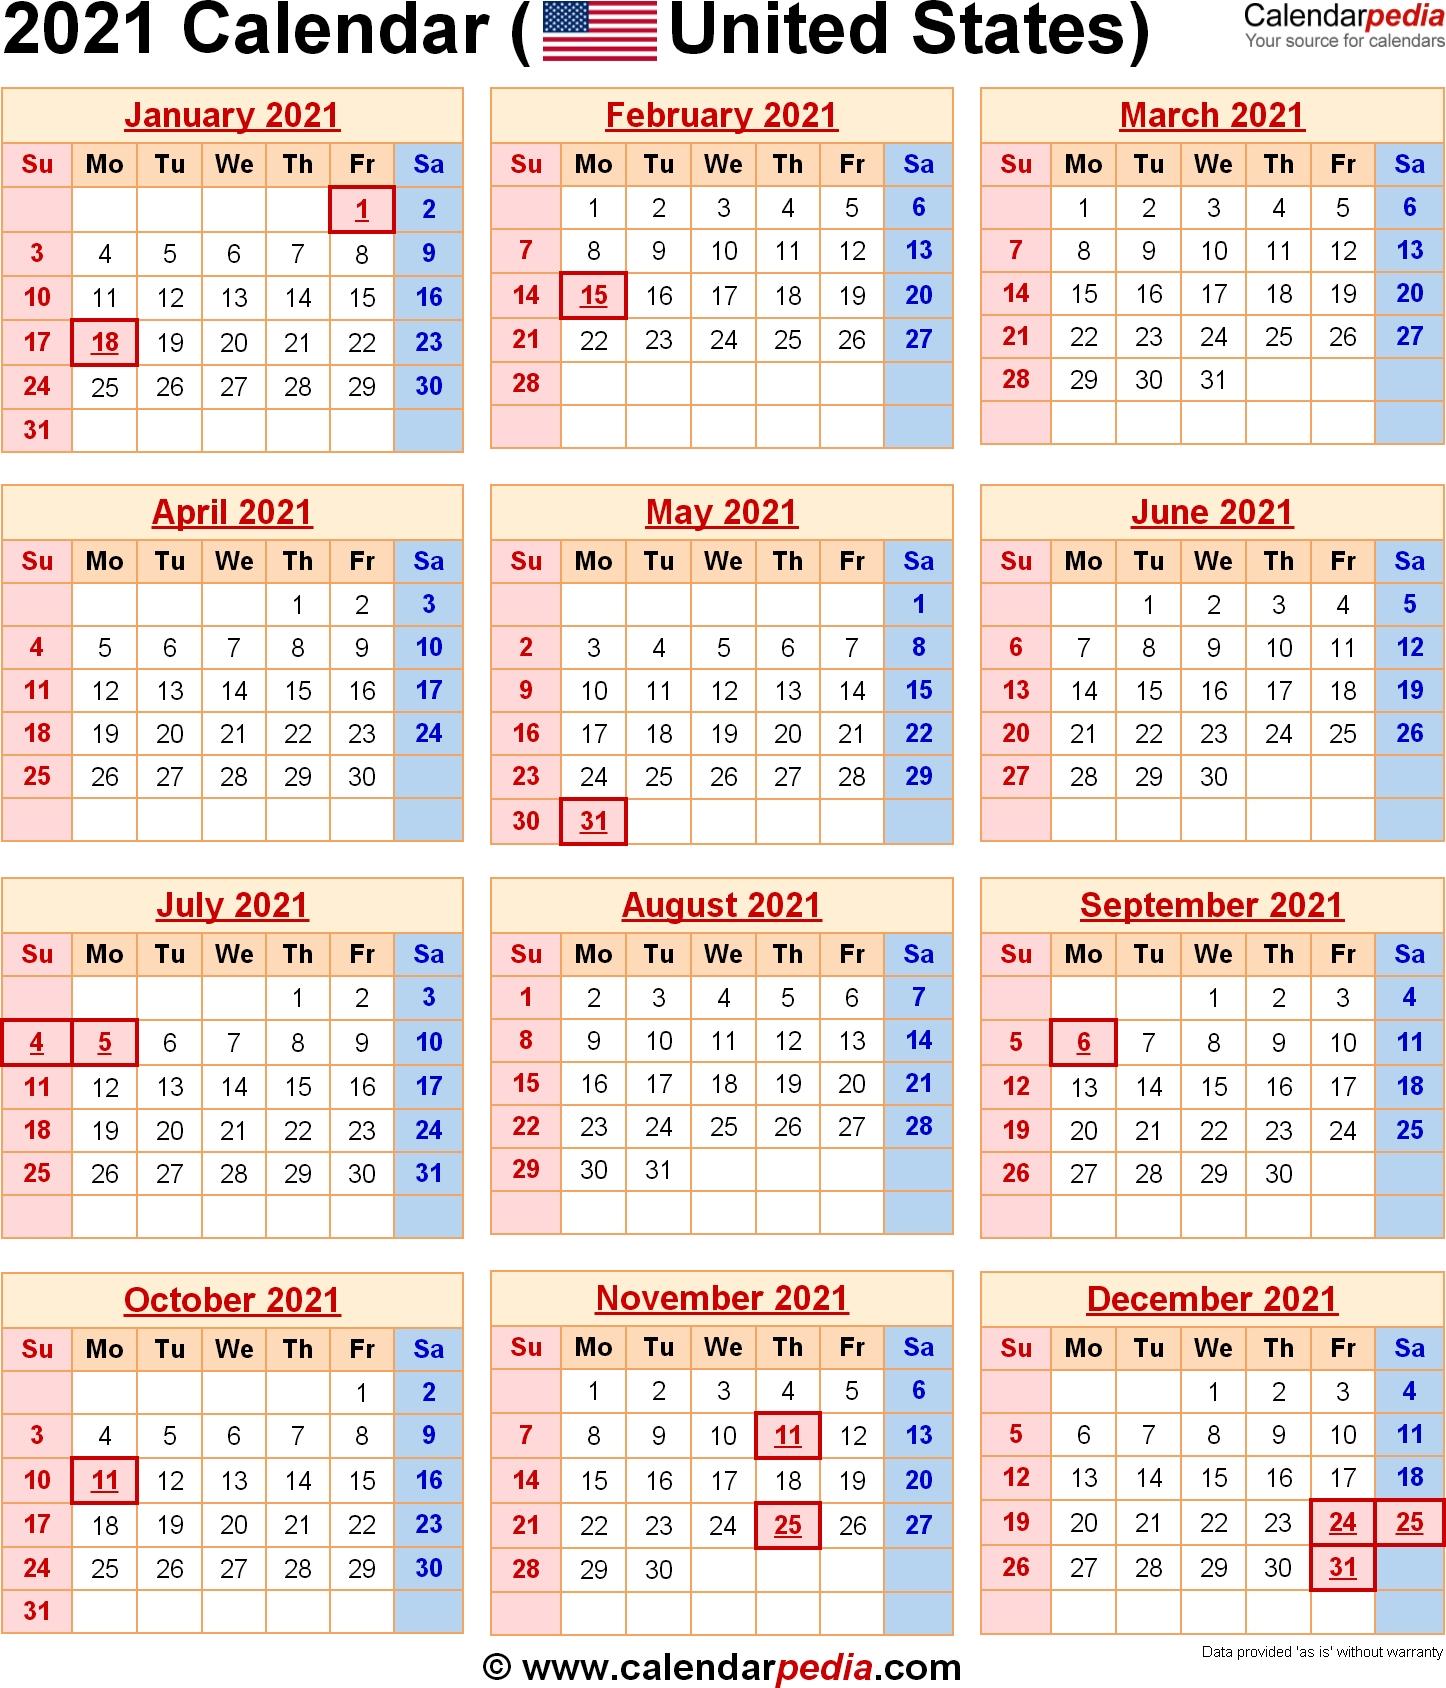 2021 Vacation Calendars | Calendar Printables Free Templates